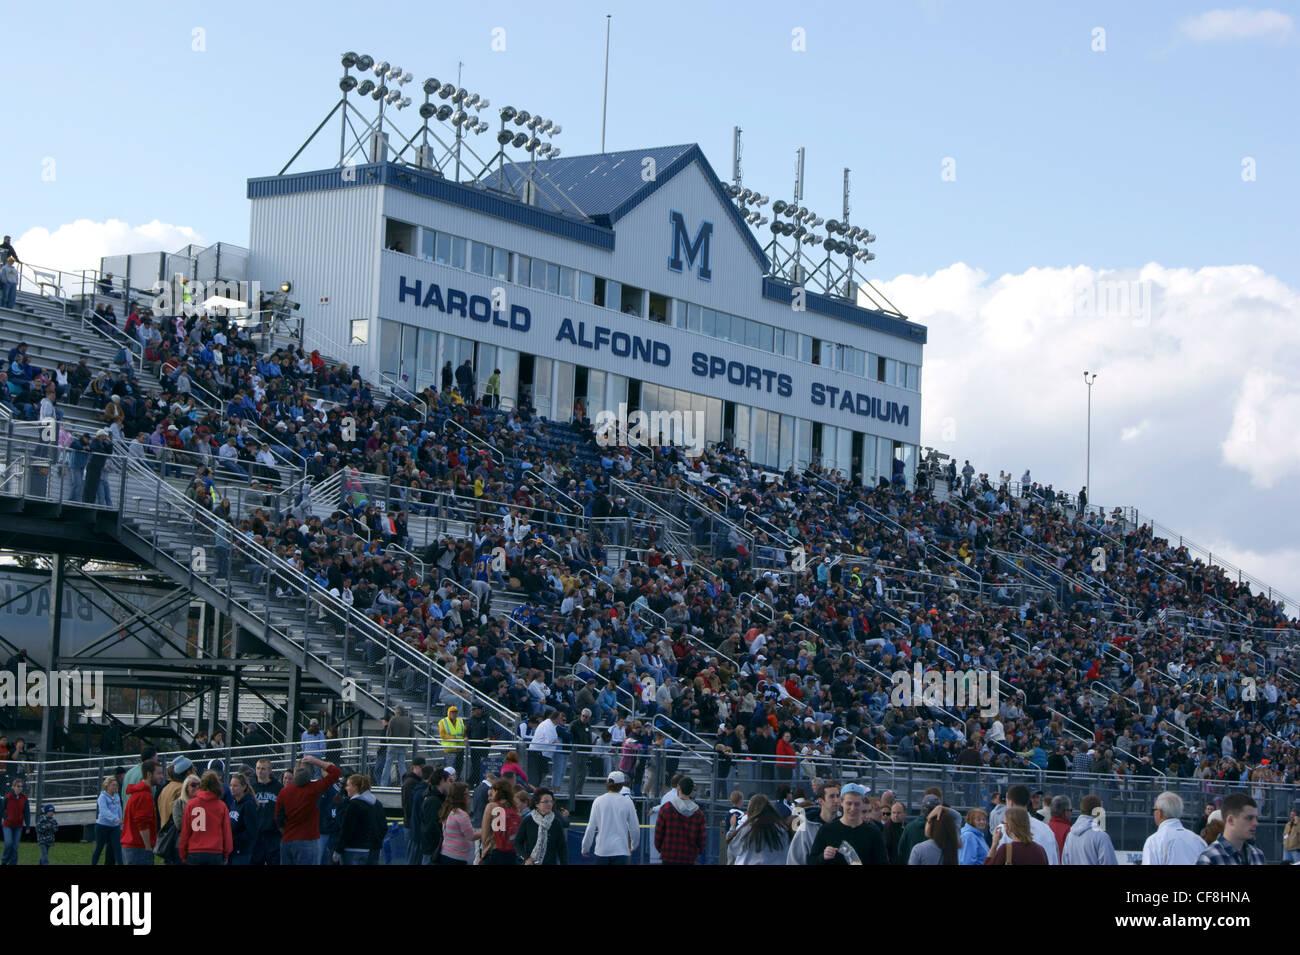 Harold Alfond Sports Stadium, University of Maine, Orono, Maine. - Stock Image